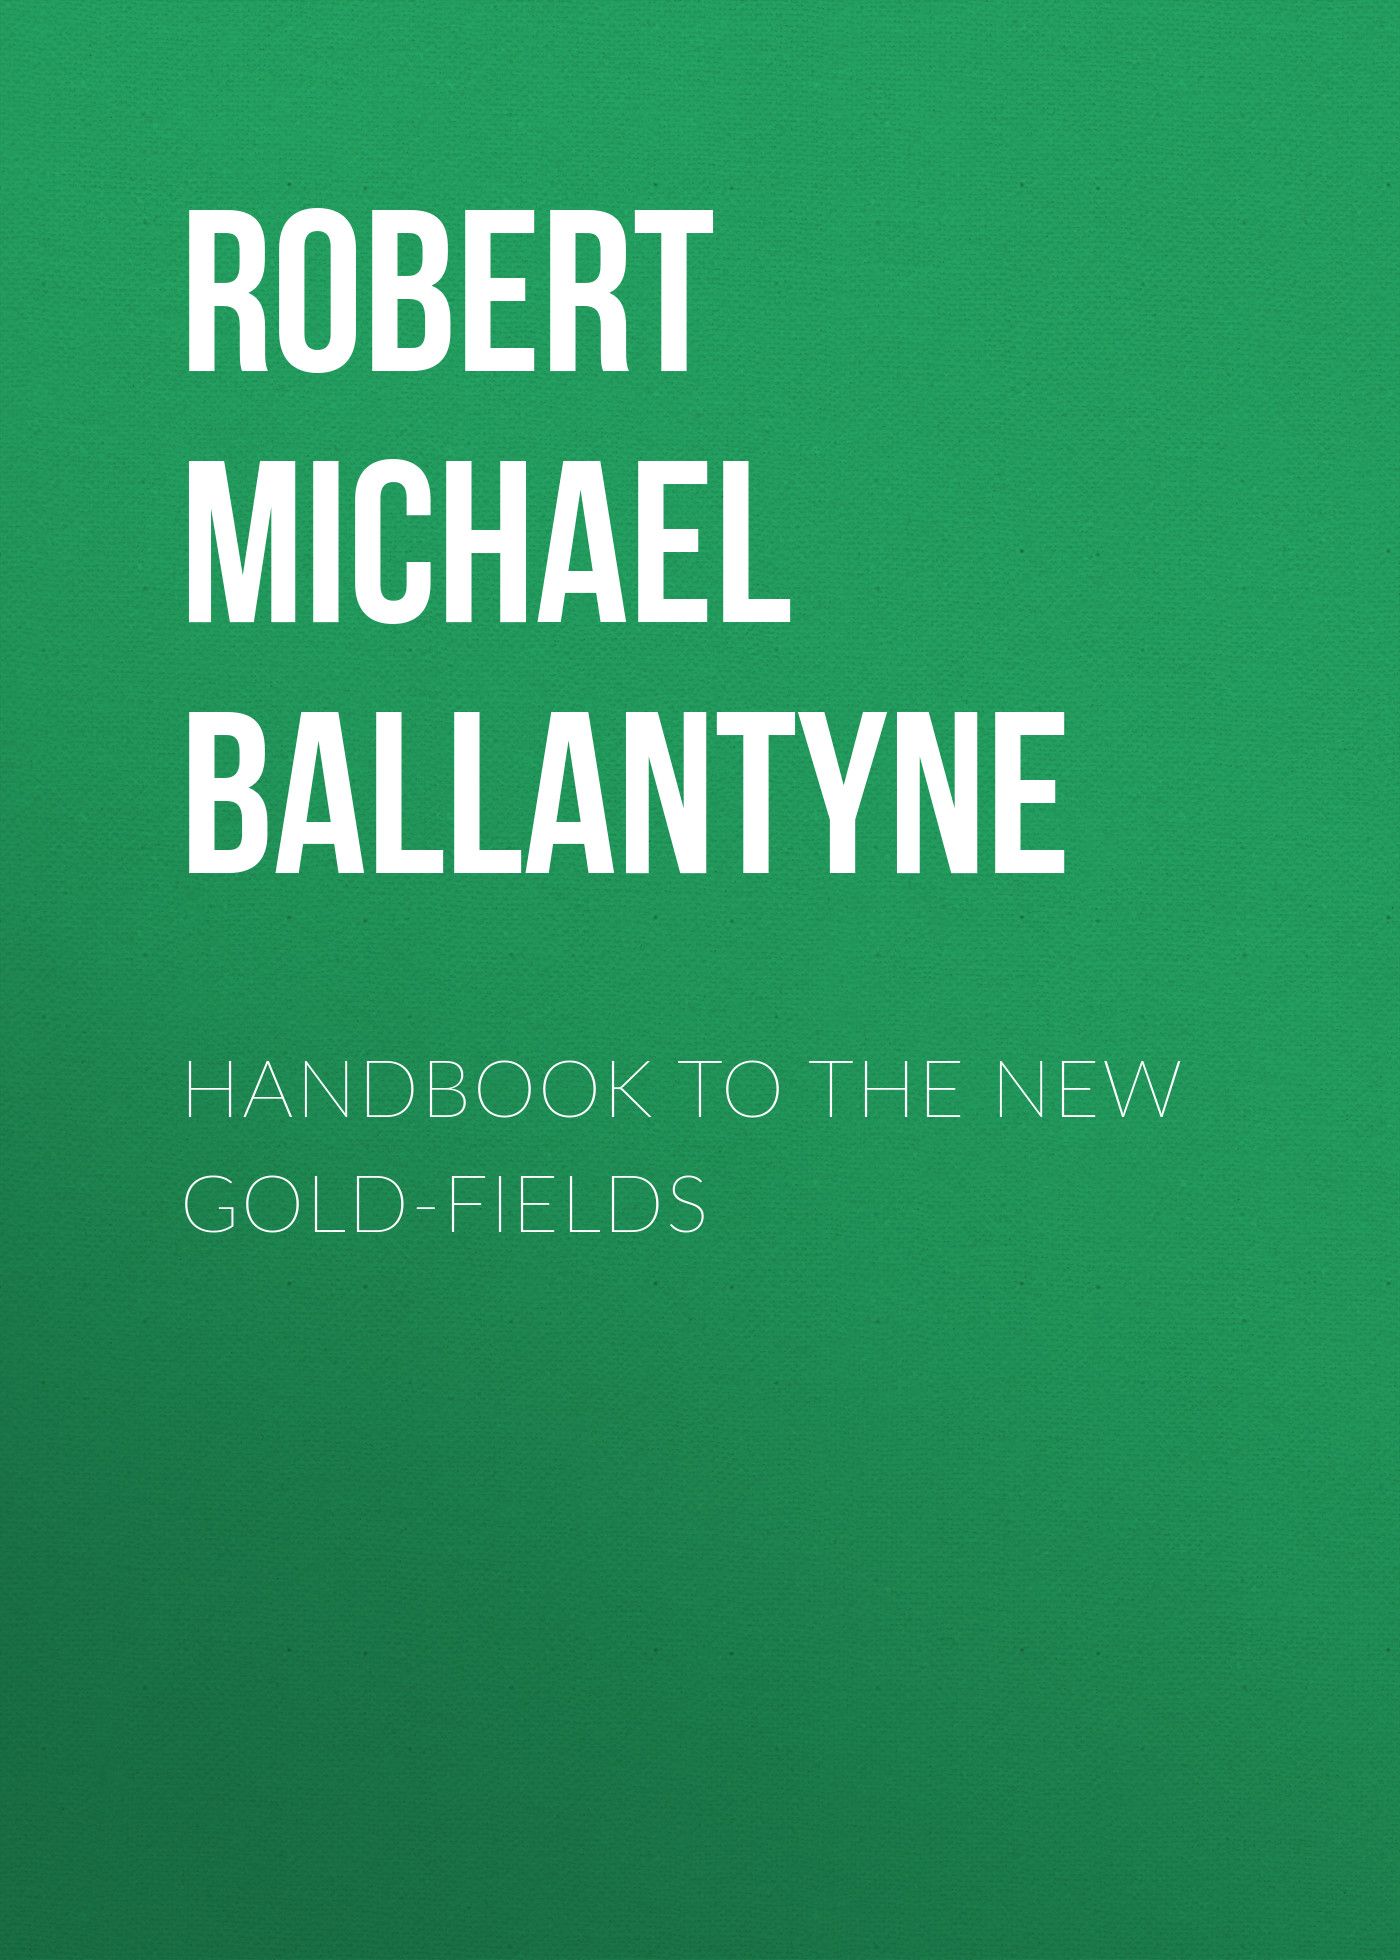 Robert Michael Ballantyne Handbook to the new Gold-fields